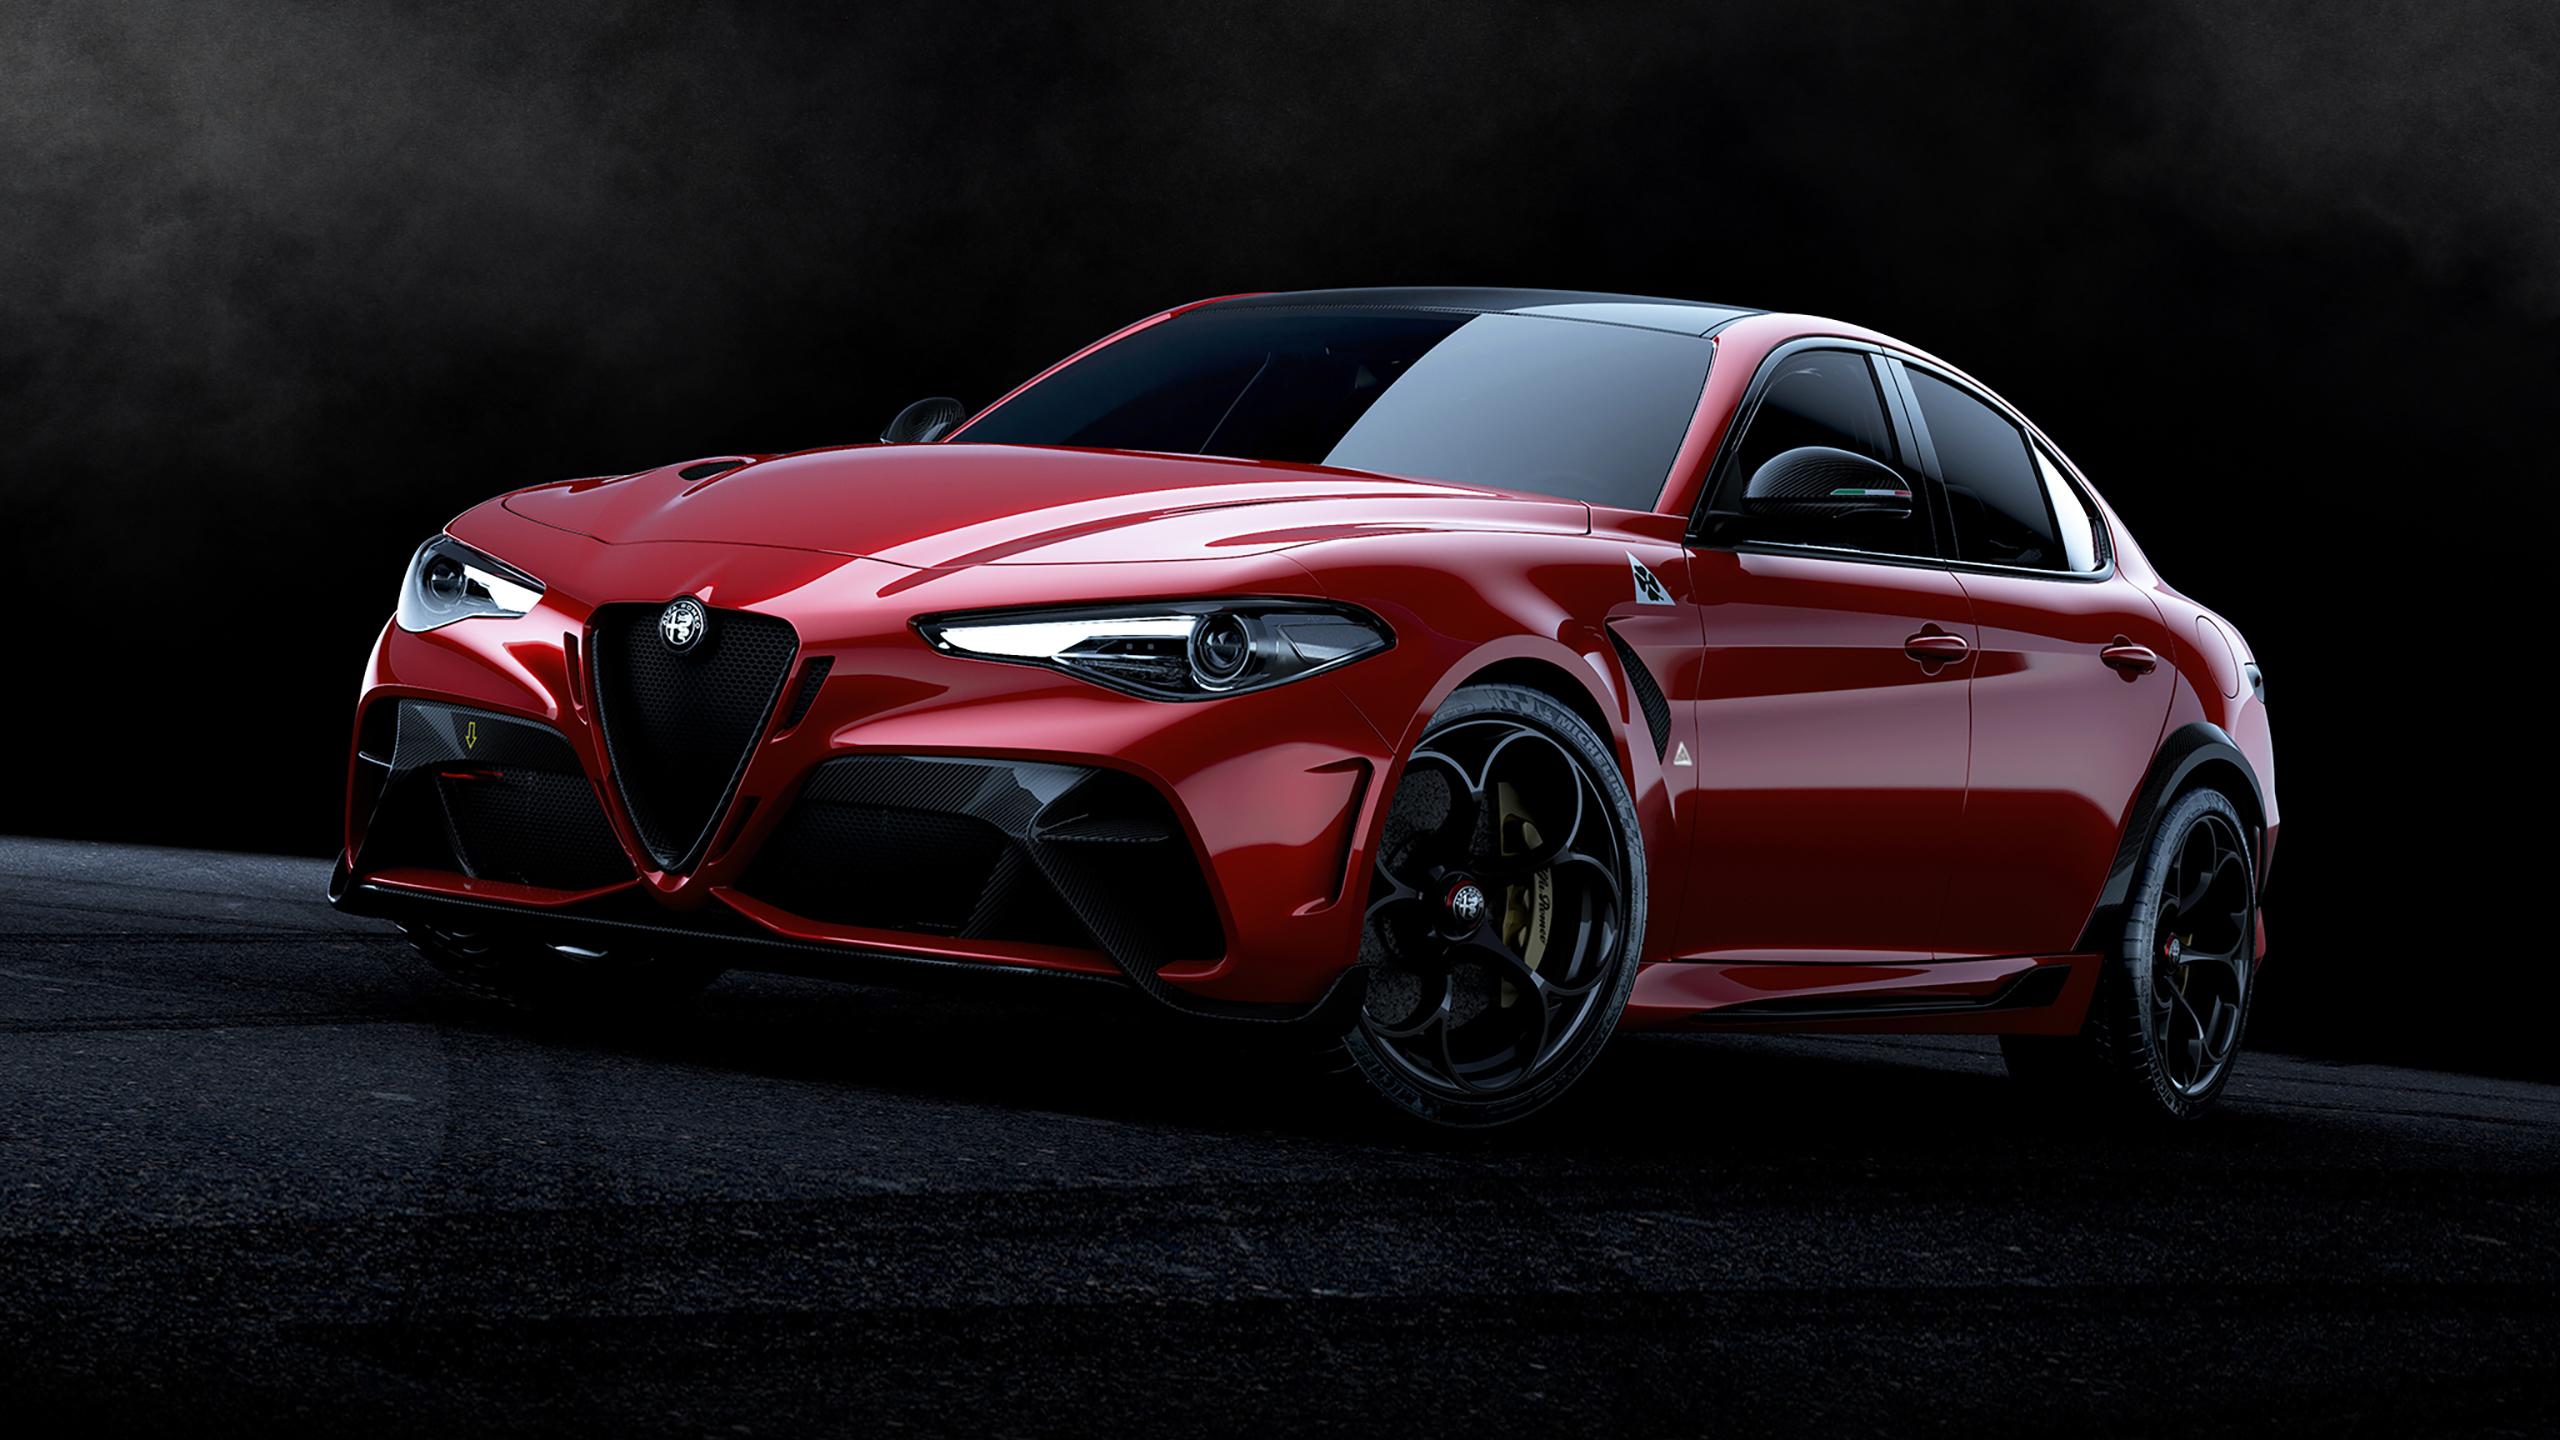 Alfa Romeo Giulia Gta 2020 Wallpaper Hd Car Wallpapers Id 14604